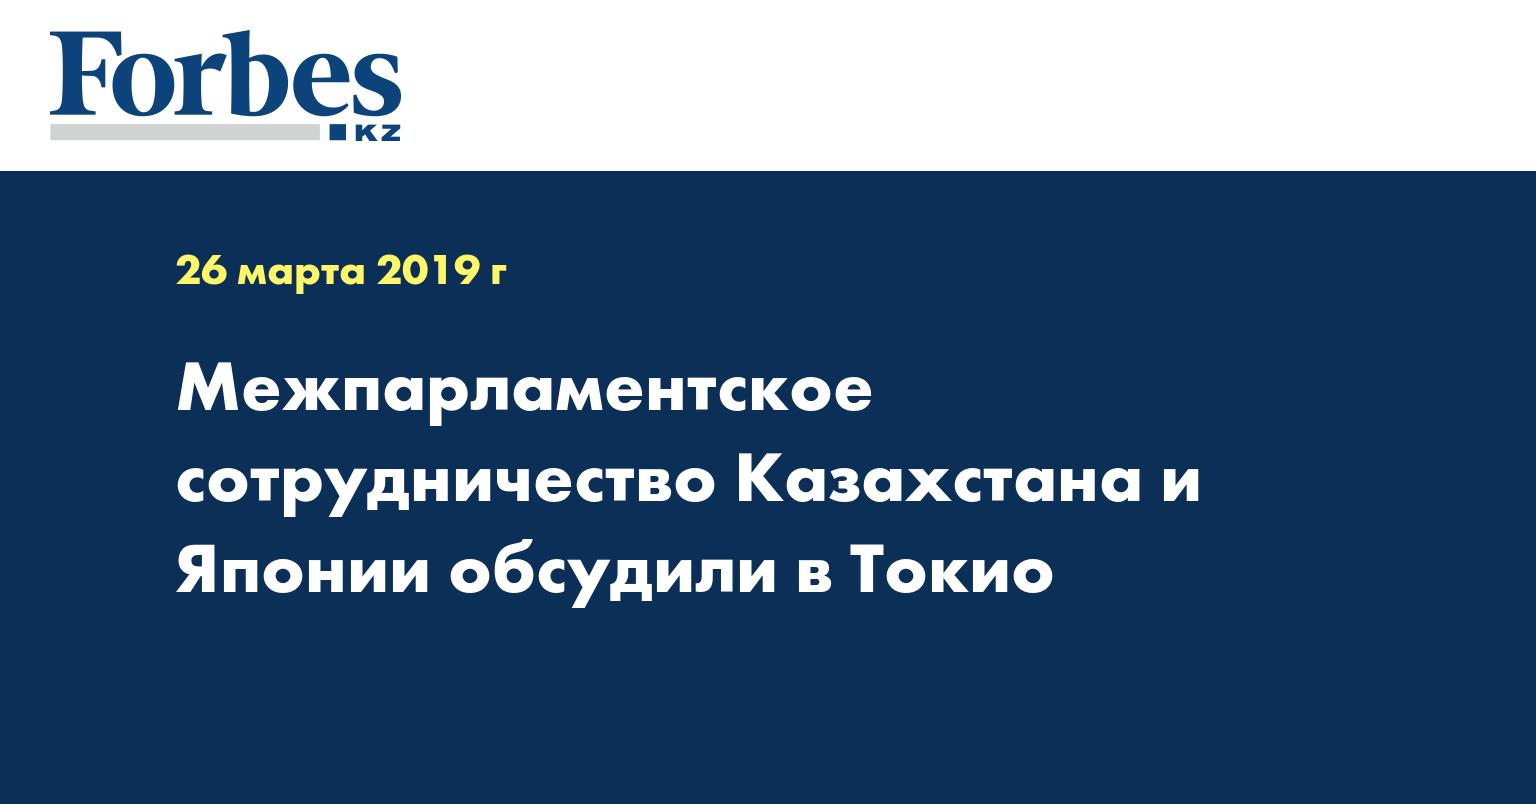 Межпарламентское сотрудничество Казахстана и Японии обсудили в Токио